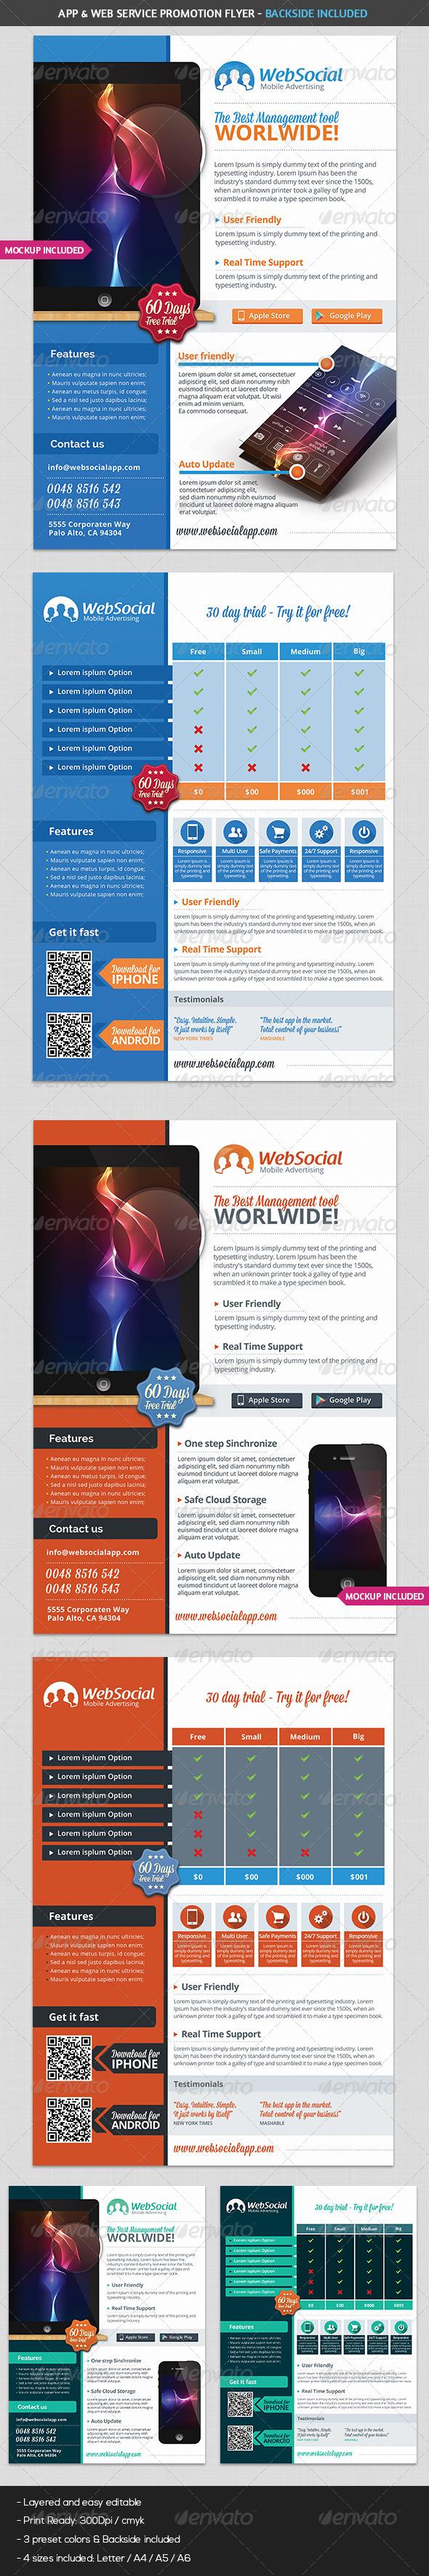 GraphicRiver App & Web Service Promotion Flyer 7503861